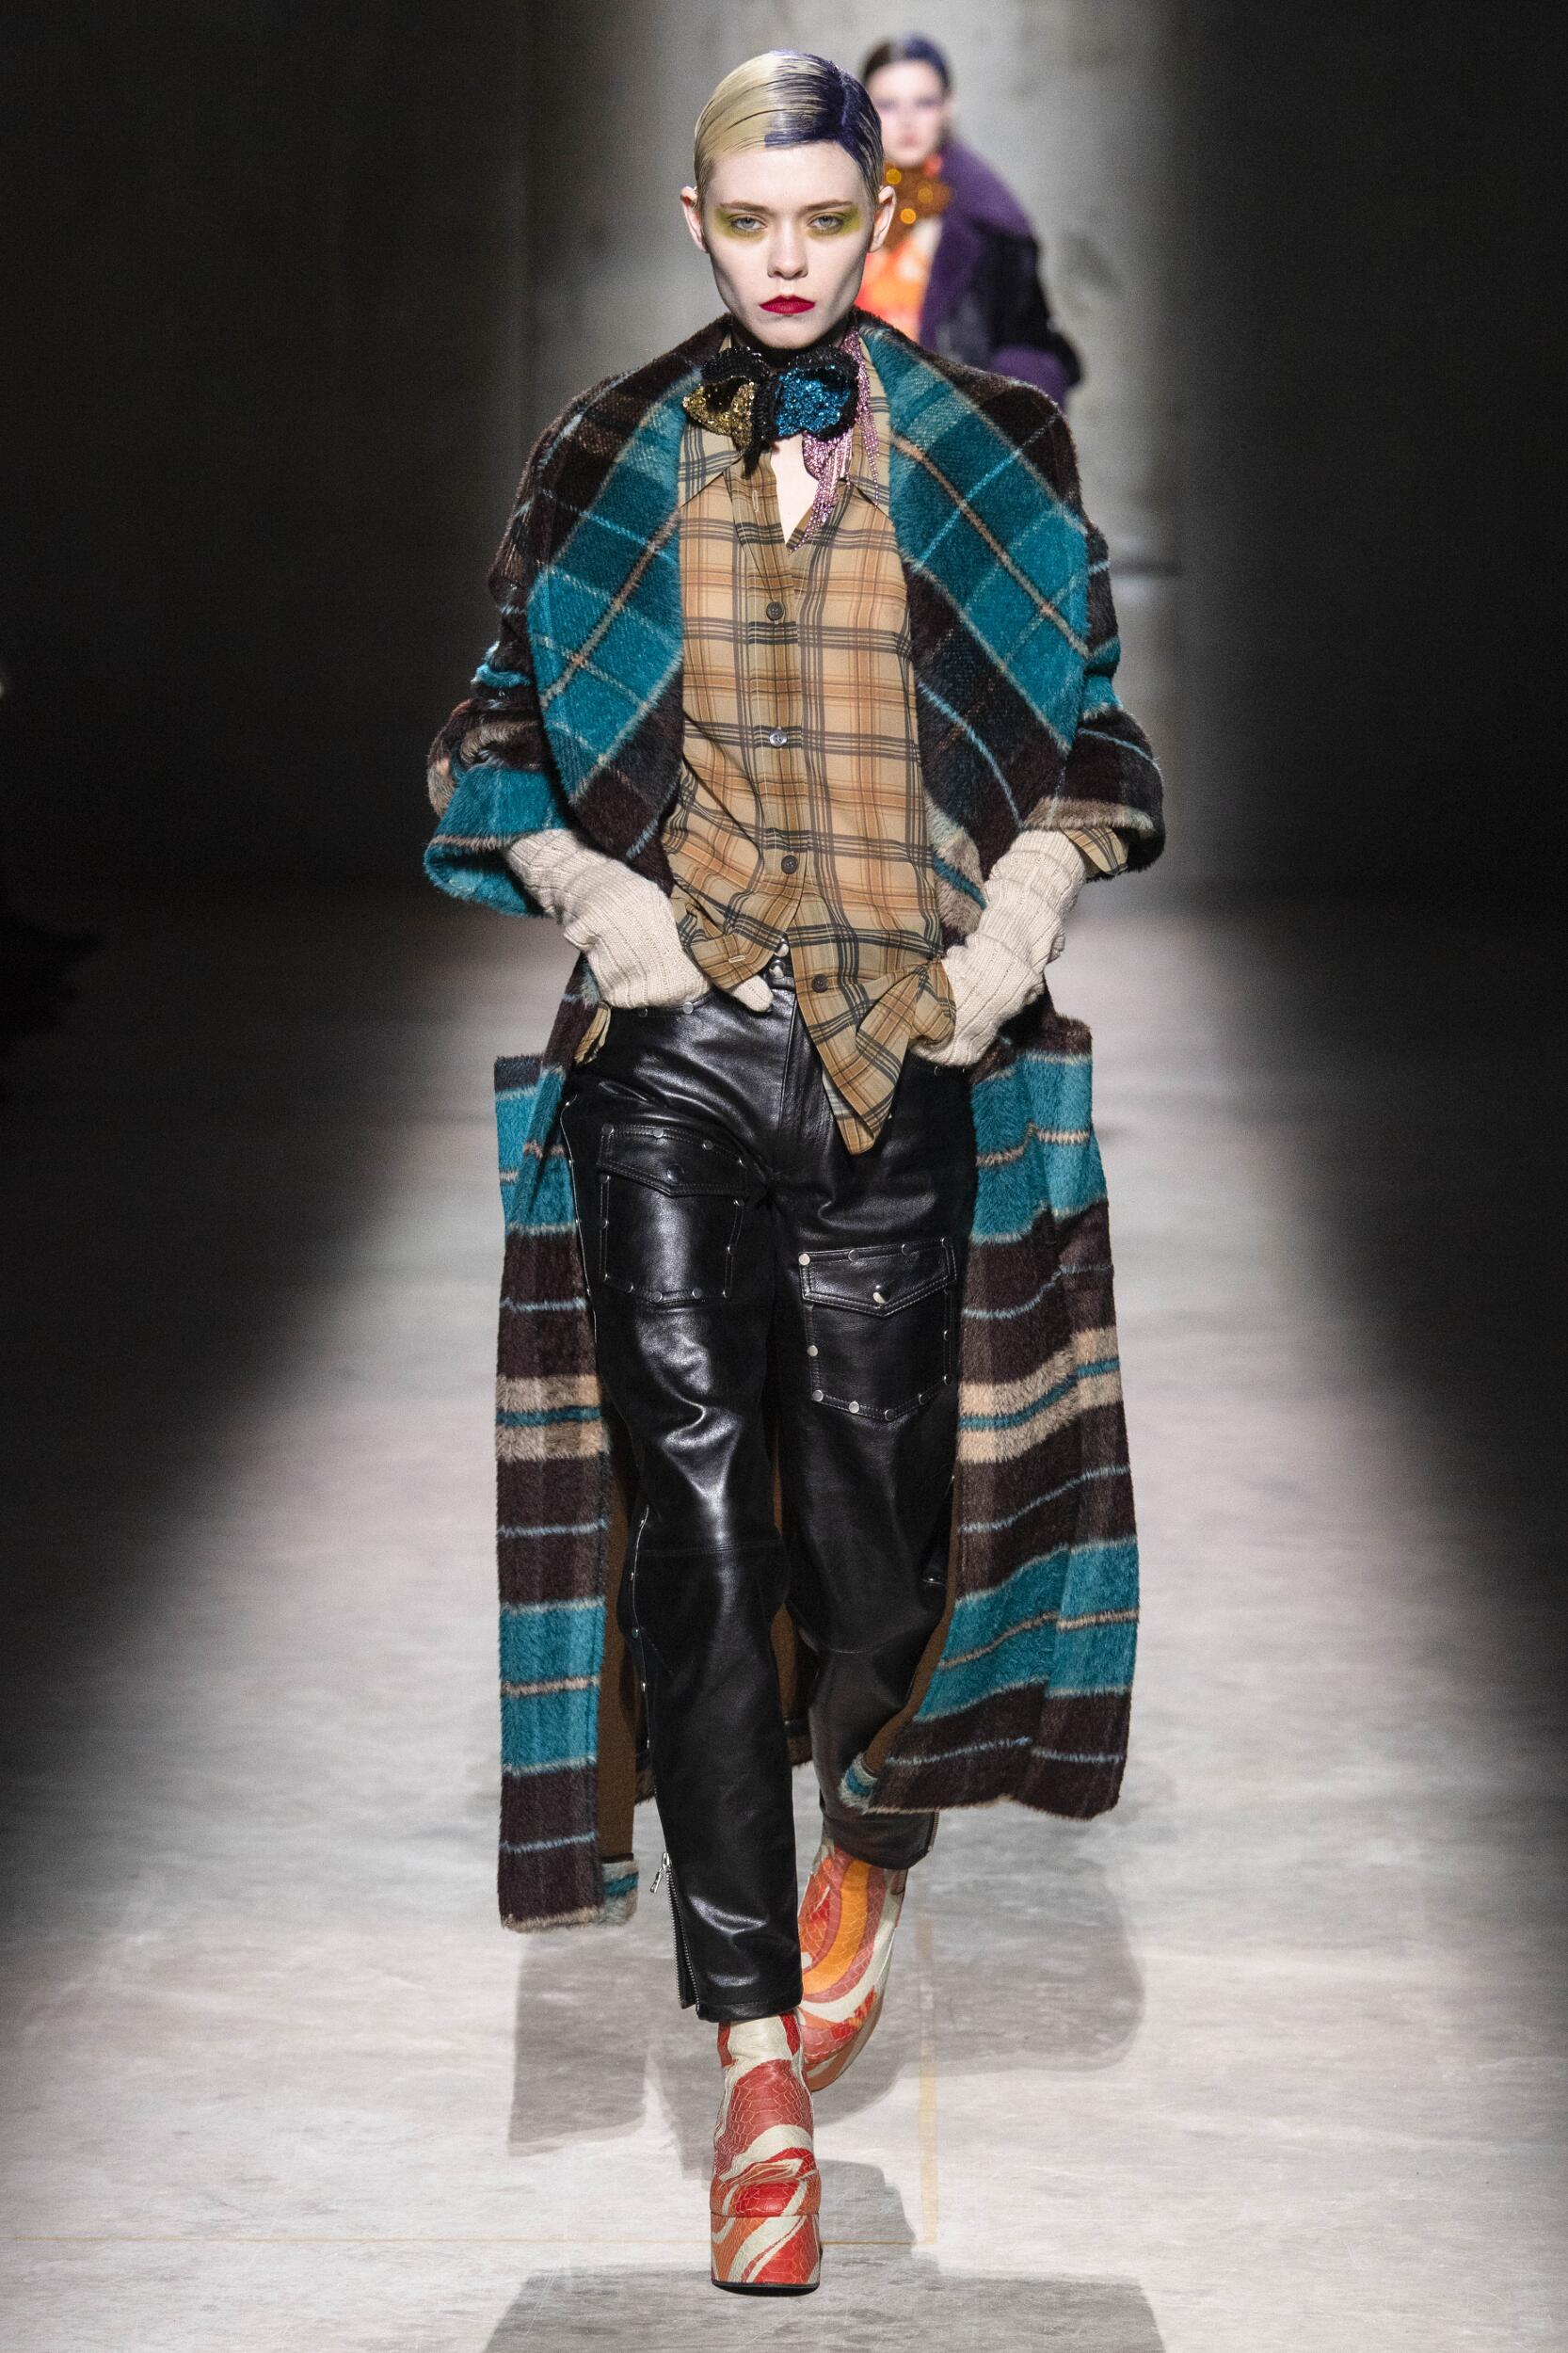 Fashion Show Woman Model Dries Van Noten Catwalk